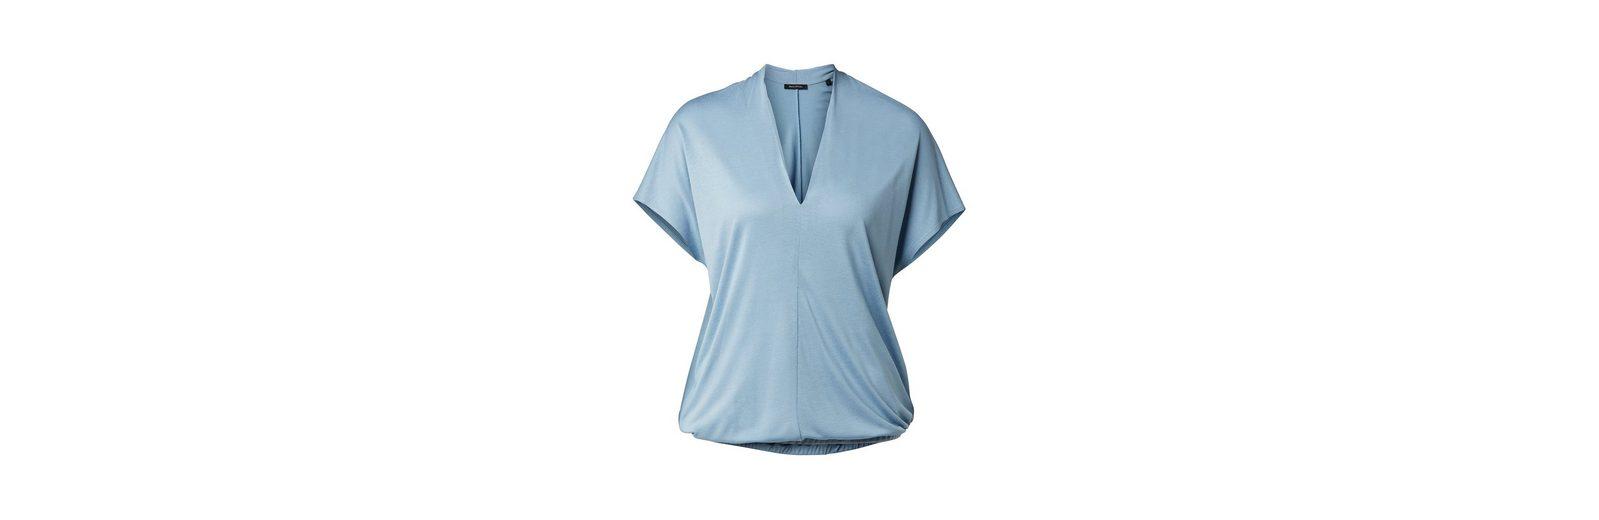 O'Polo T T Marc Marc O'Polo Shirt Shirt T O'Polo Marc vpCx7p